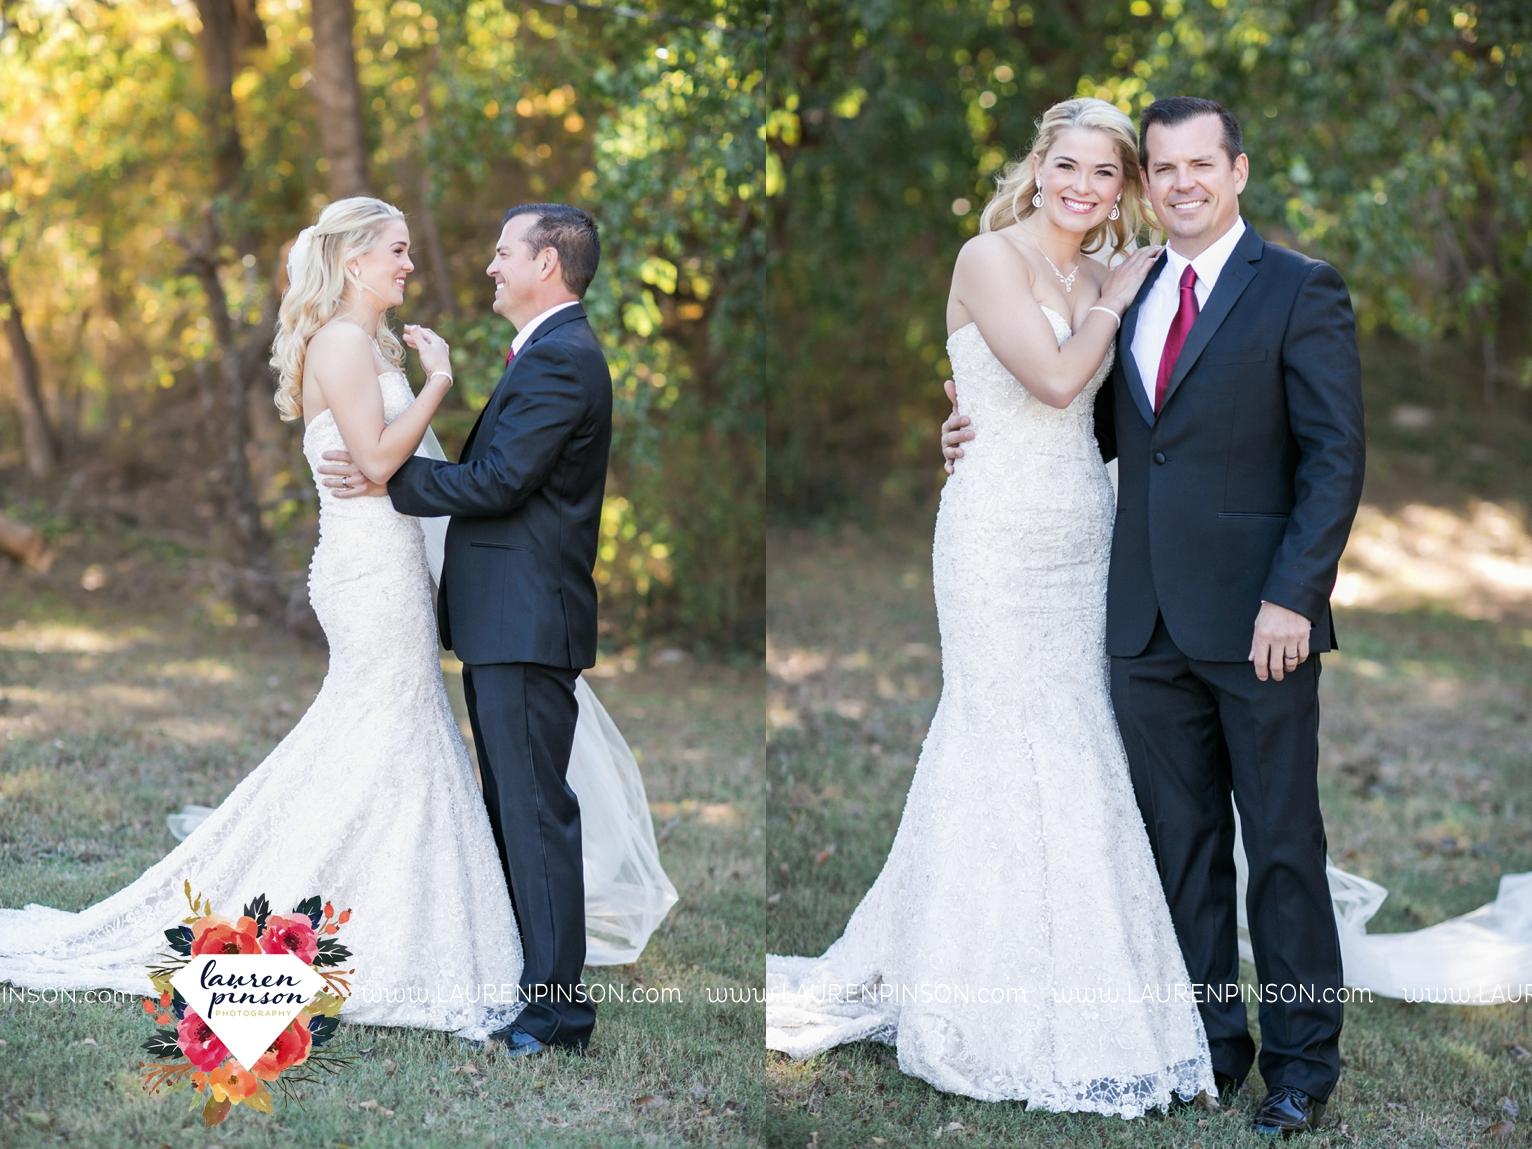 rustic-wichita-falls-texas-wedding-photographer-gold-glam-mayfield-events-market-street-united-allue-bridals-fall_1718.jpg